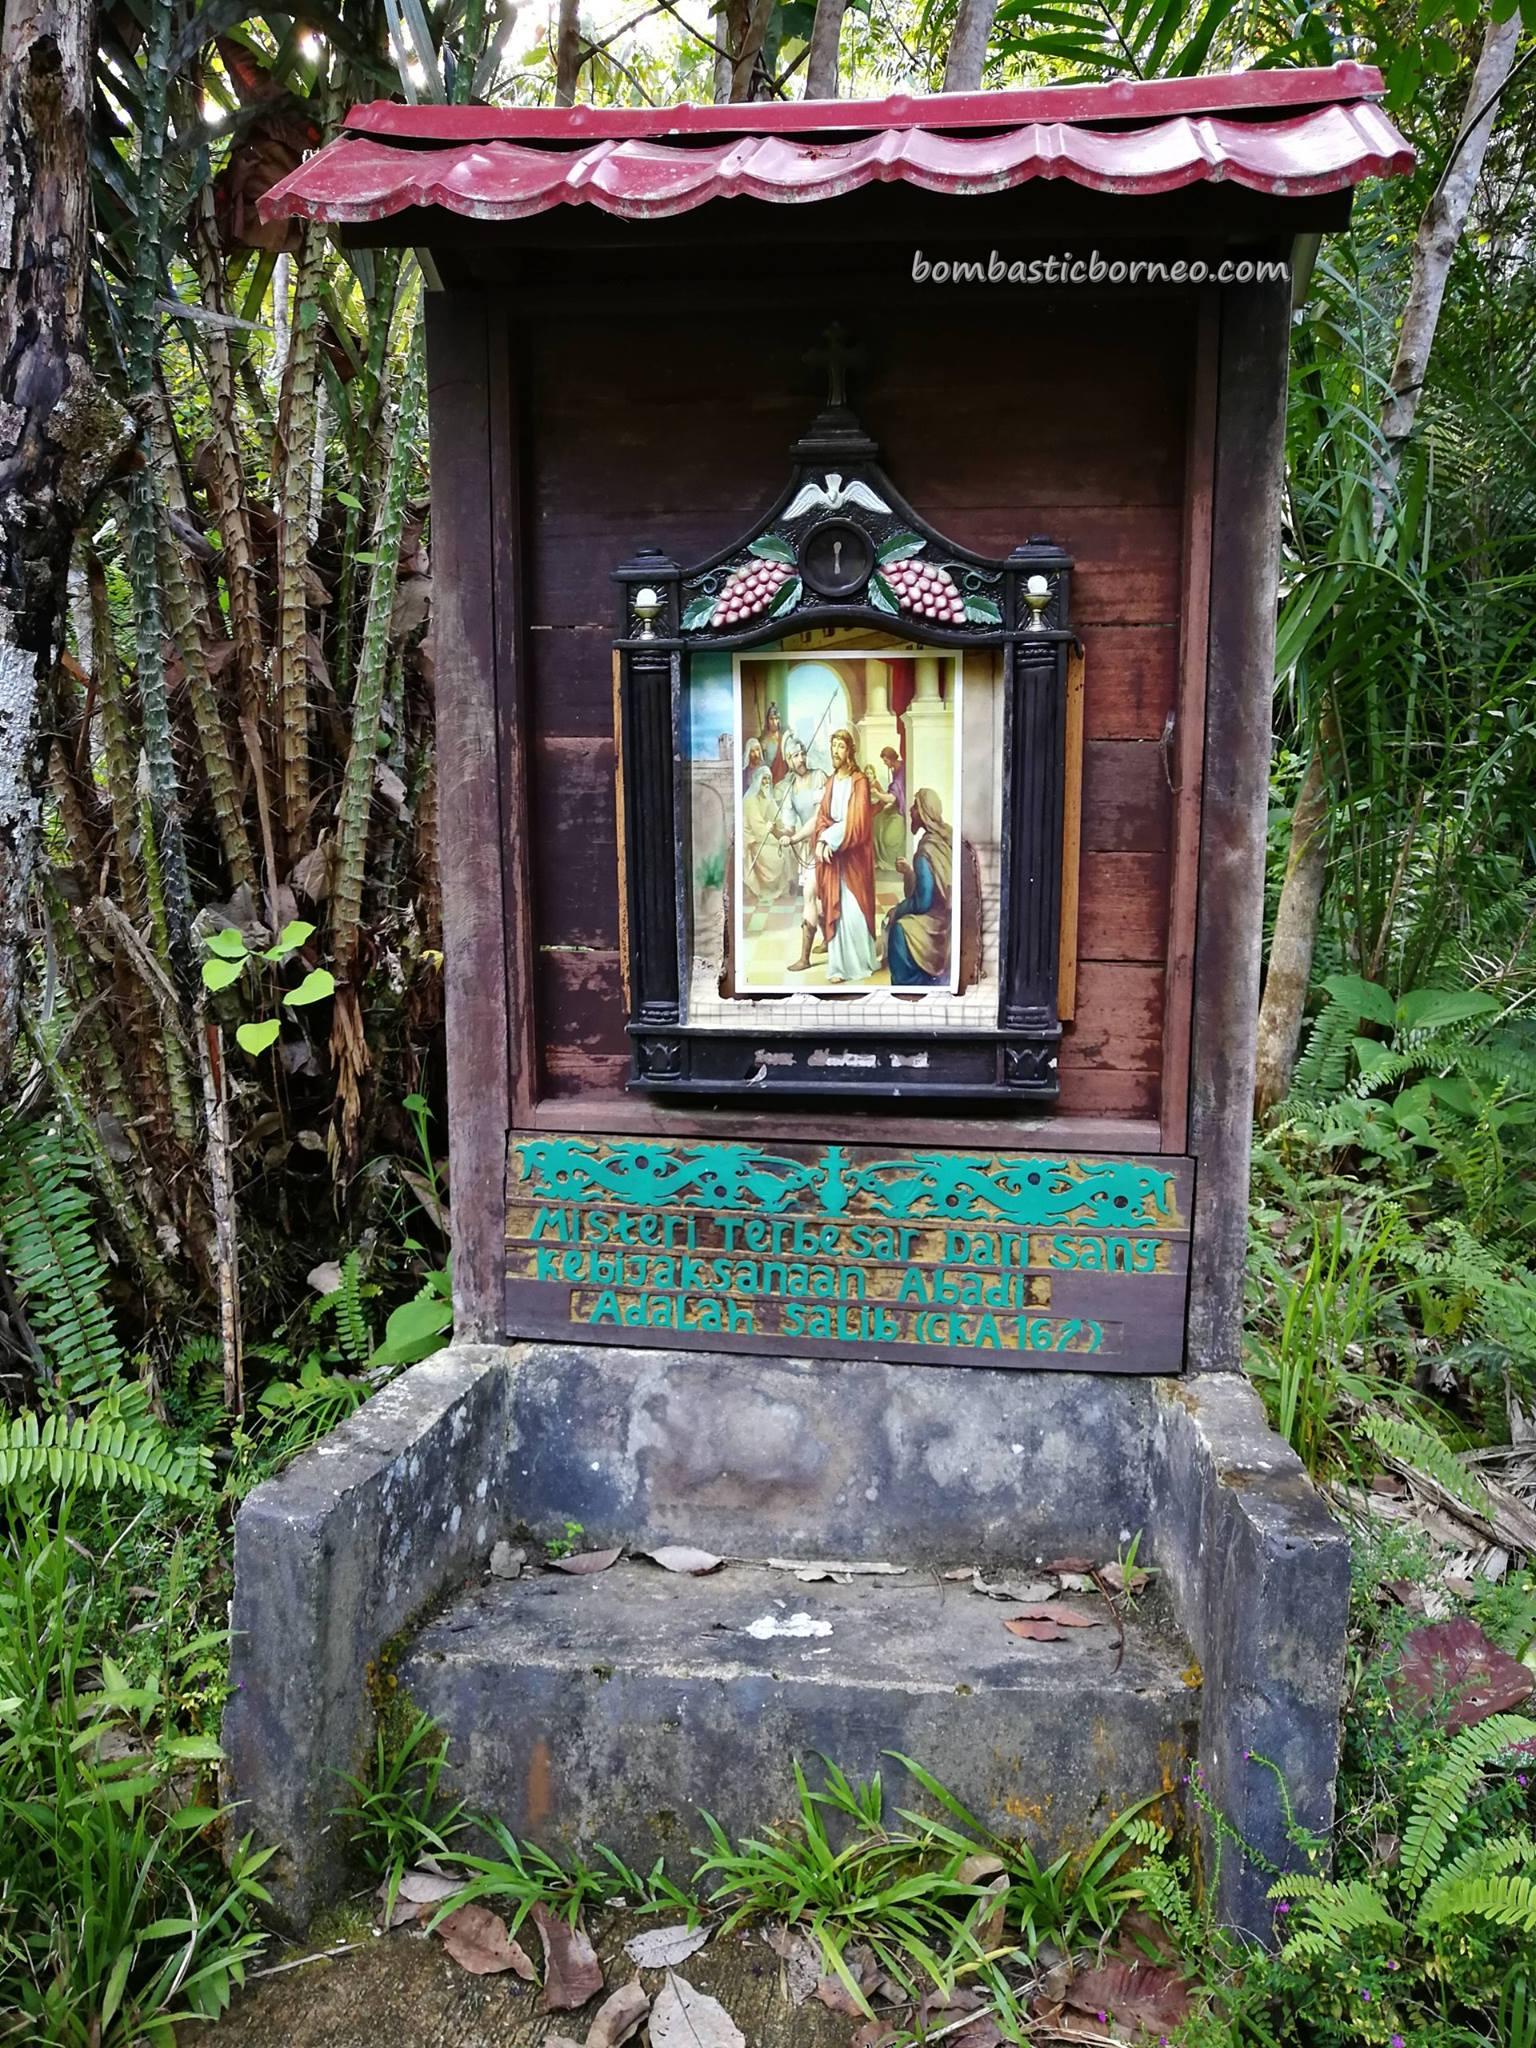 Mother Mary Cave, adventure, nature, waterfall, backpackers, destination, Borneo, Kalimantan Barat, Kapuas Hulu, Tourism, tourist attraction, travel guide, crossborder, 婆罗洲西加里曼丹, 玛丽亚洞穴